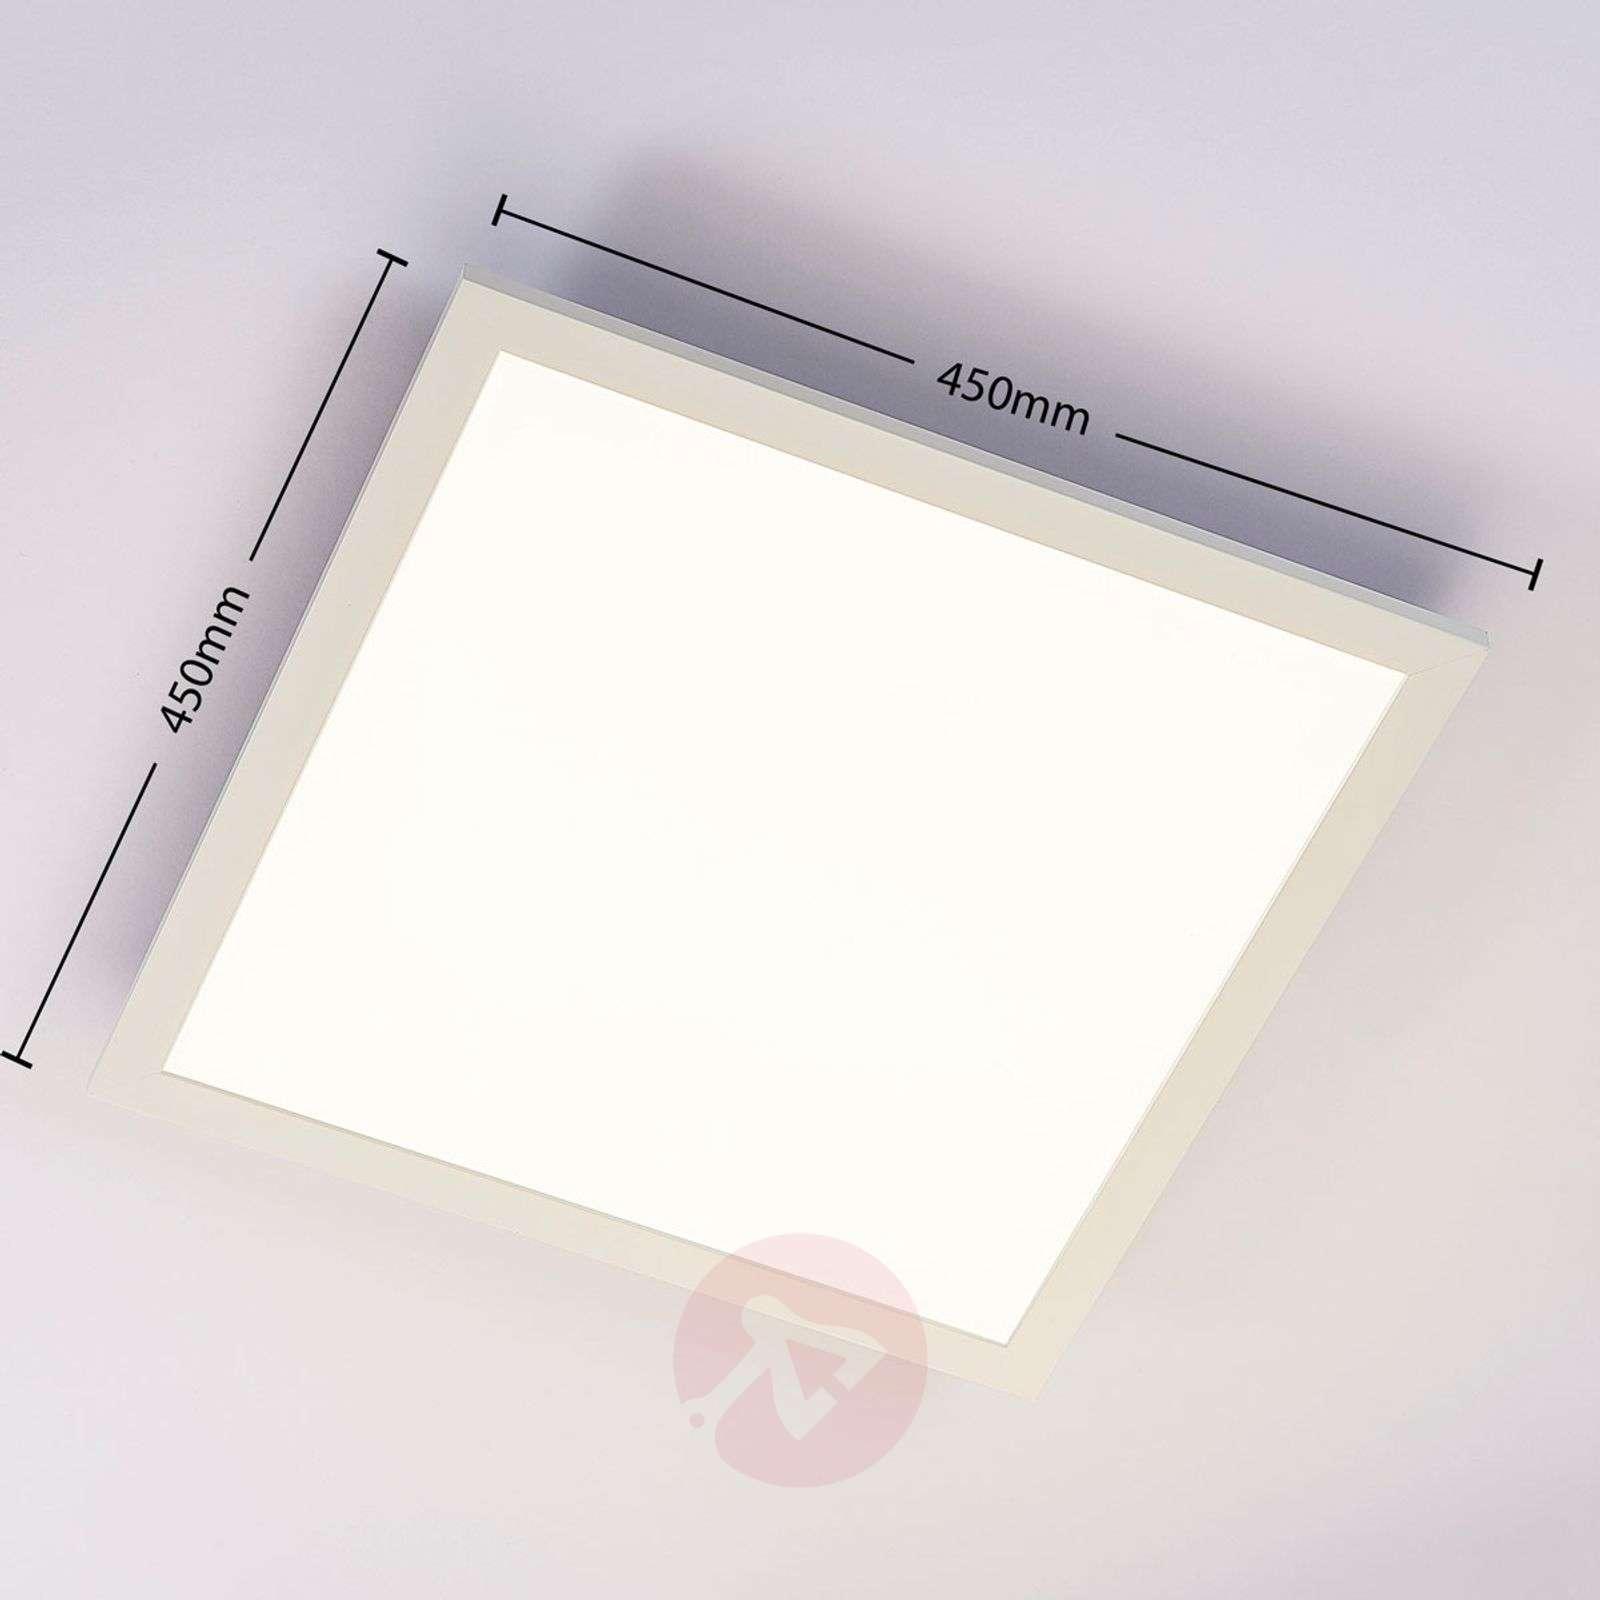 LED-paneeli Tinus, värin vaihto RGB – lämmin valk.-9621652-01